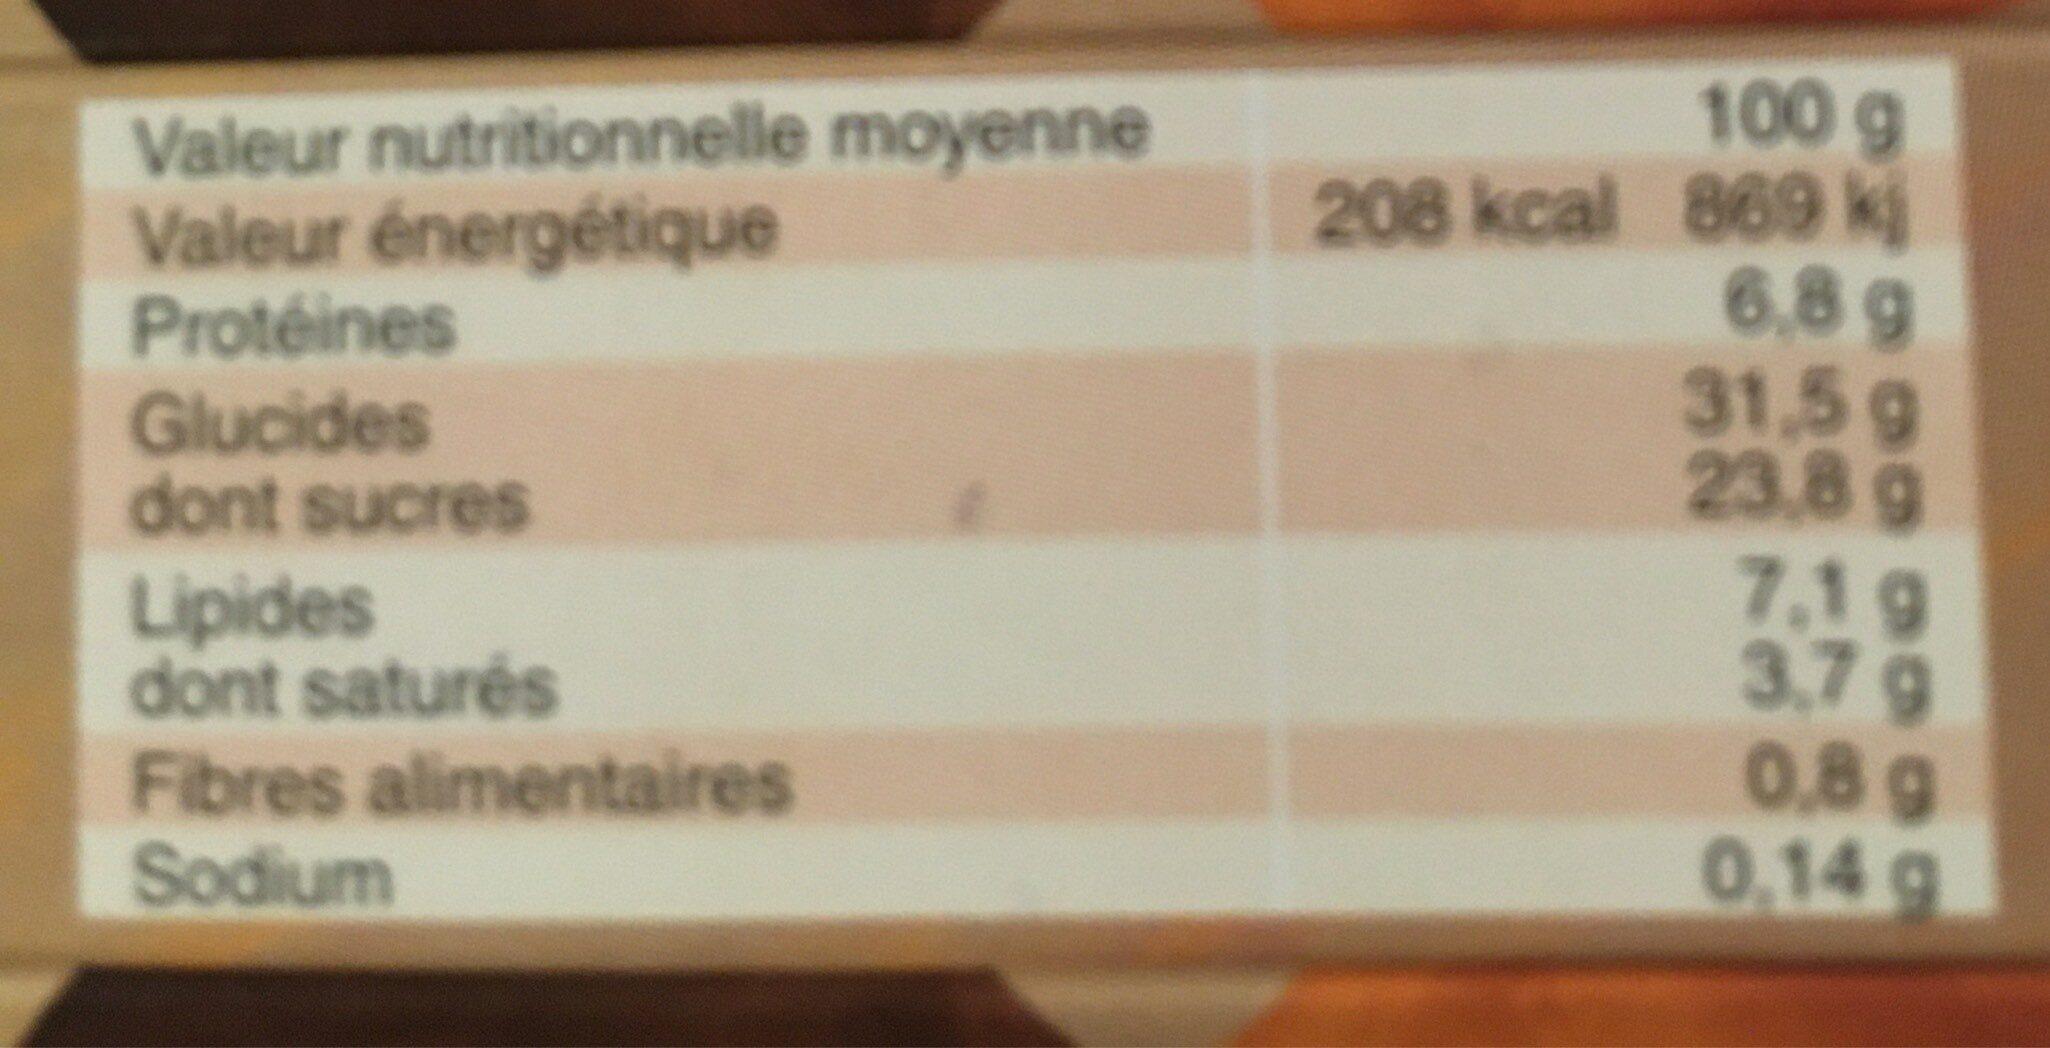 Crème caramel beurre salé - Voedingswaarden - fr